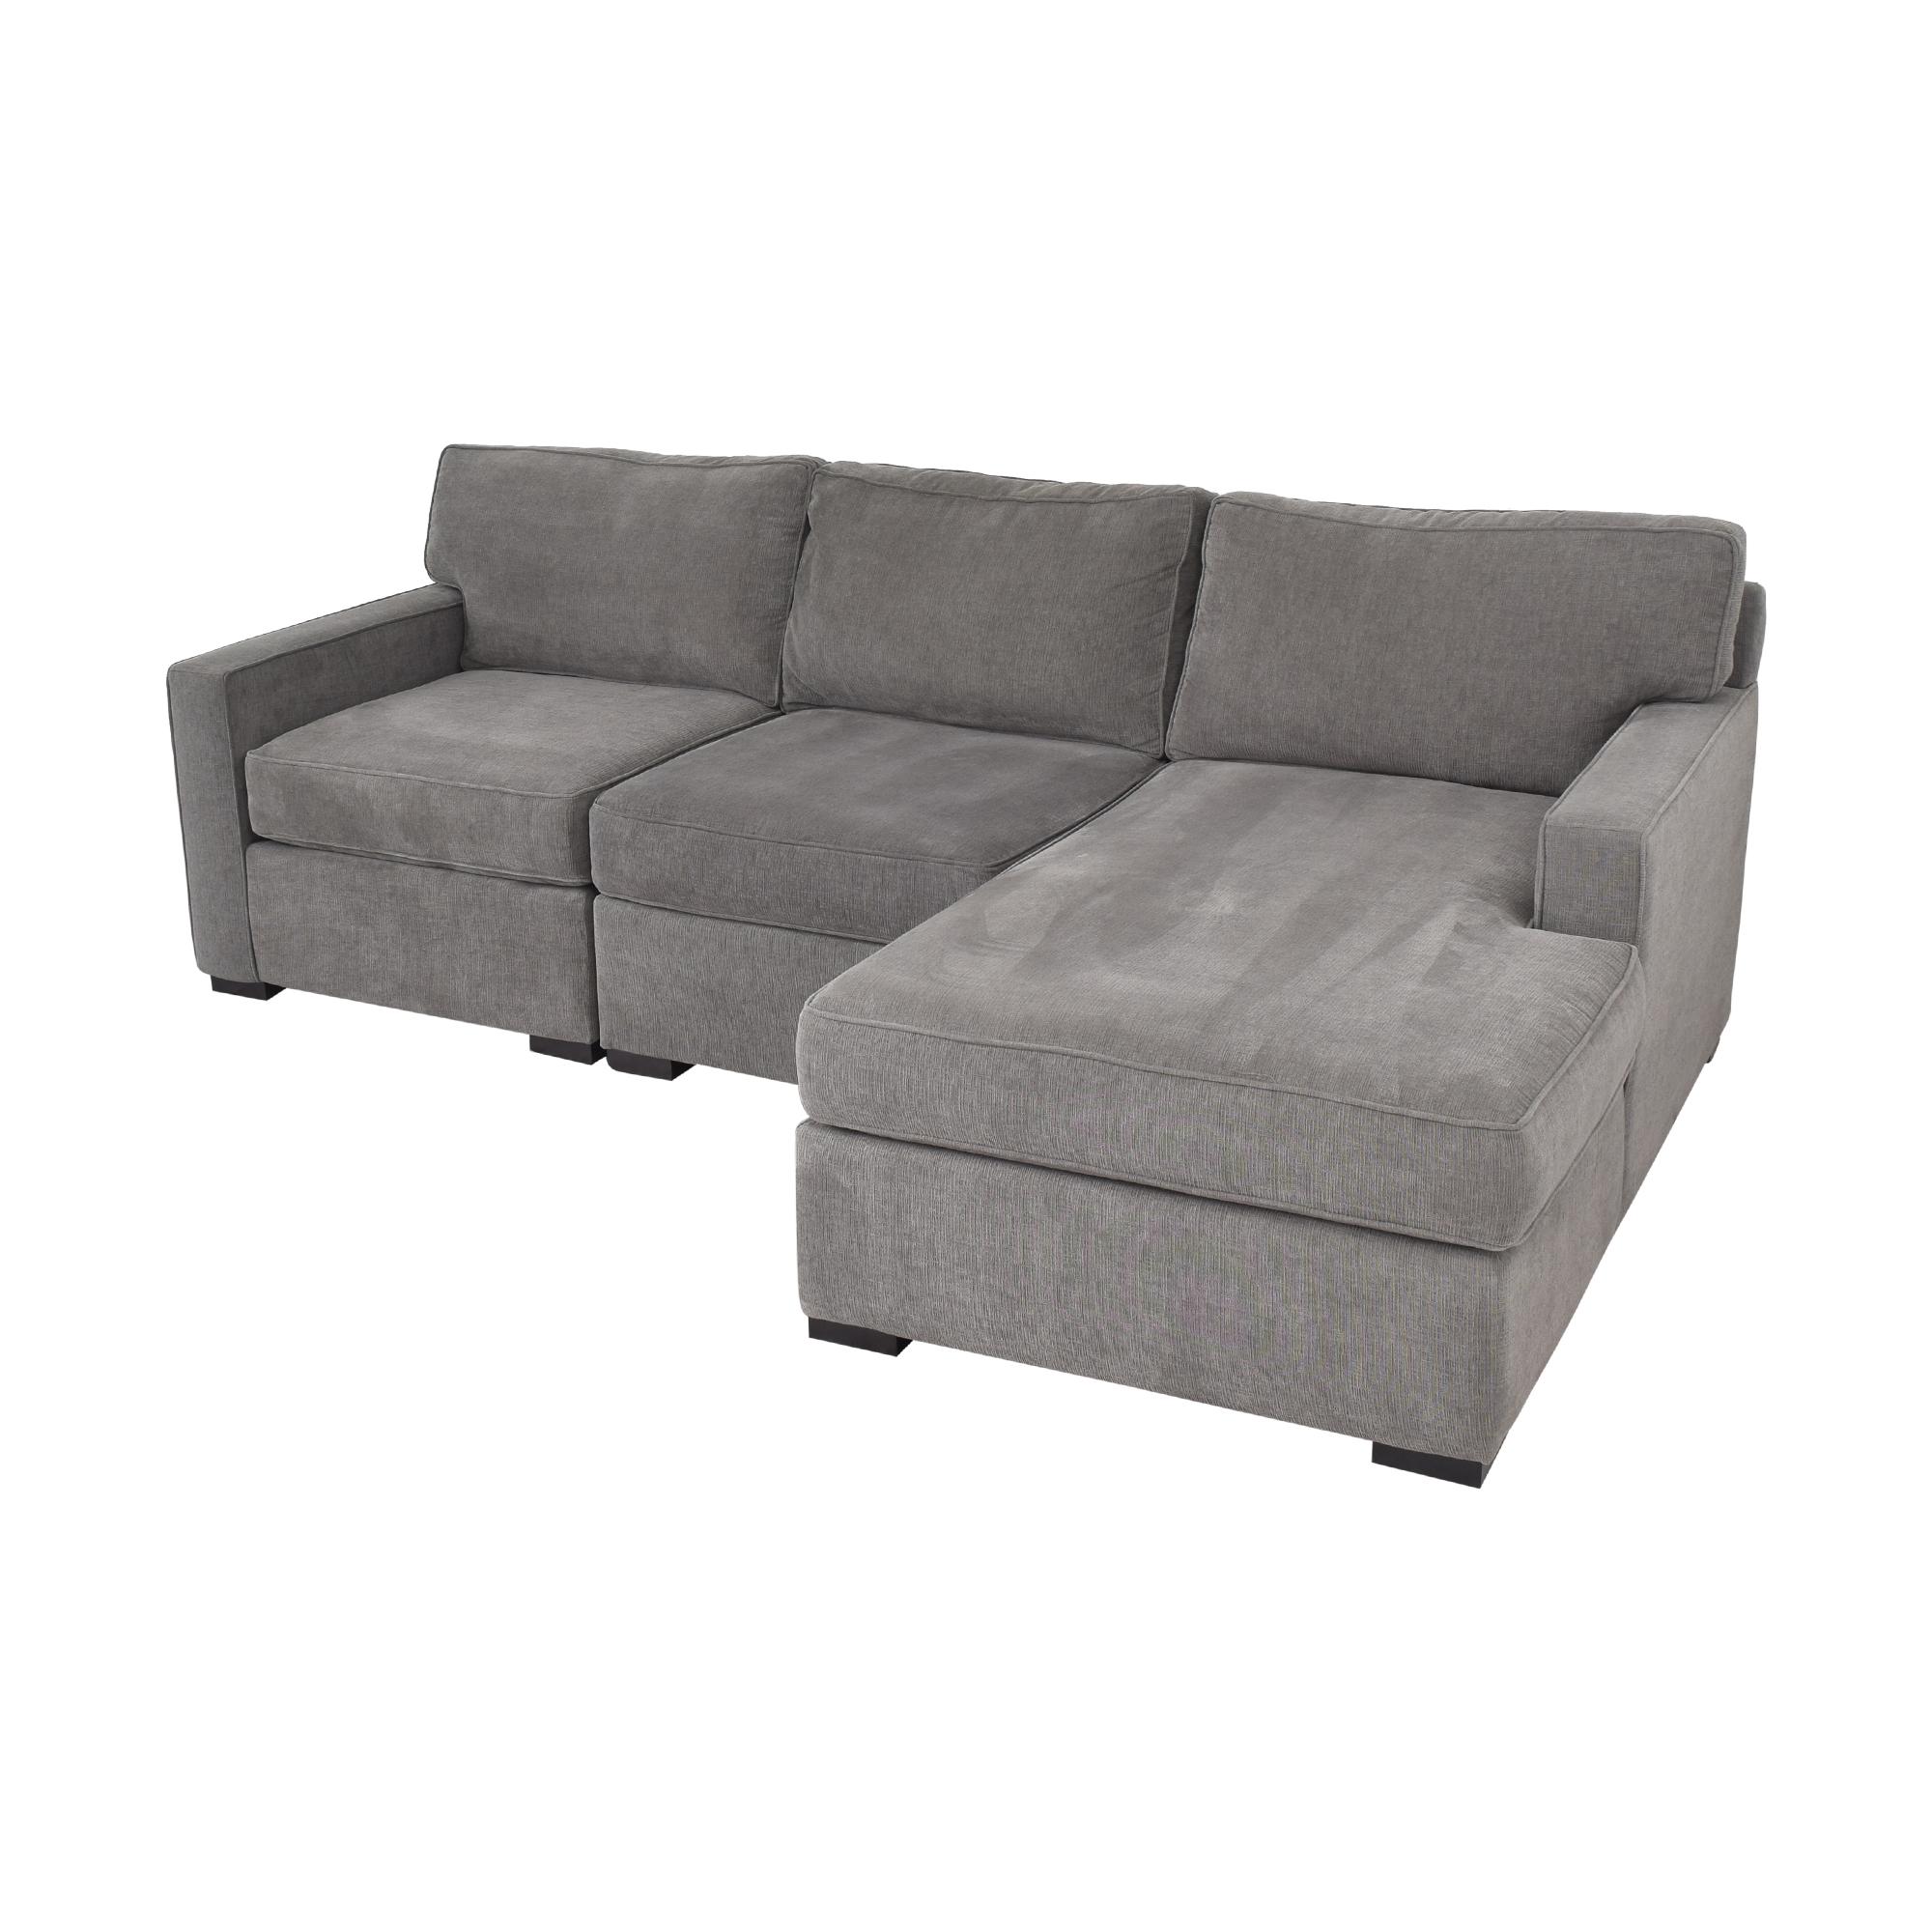 Macy's Macy's Radley Three Piece Chaise Sectional Sofa on sale